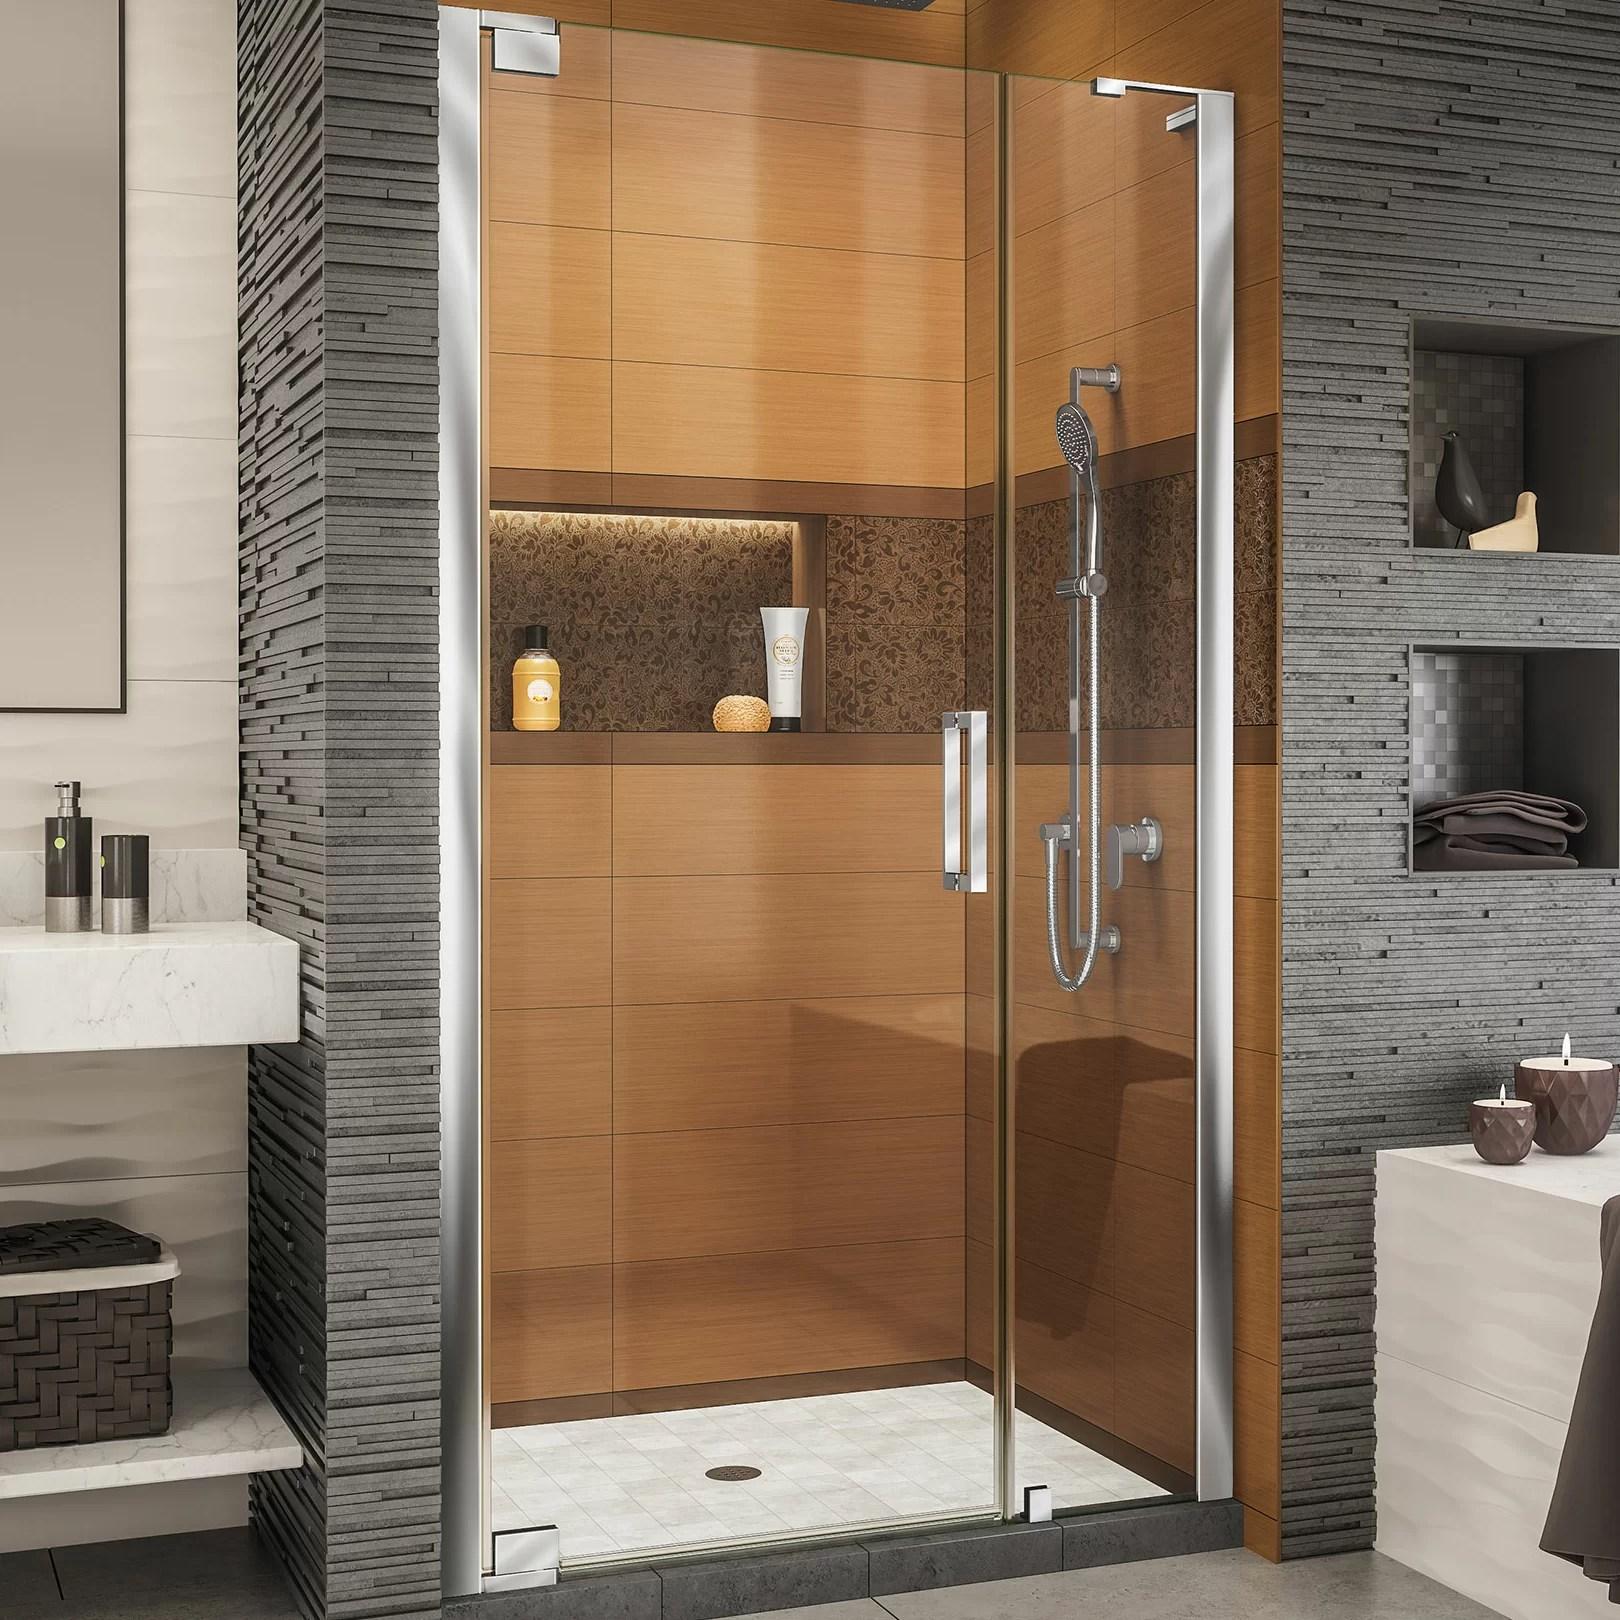 Elegance Ls 46 X 72 Pivot Frameless Shower Door With Clearmax Technology